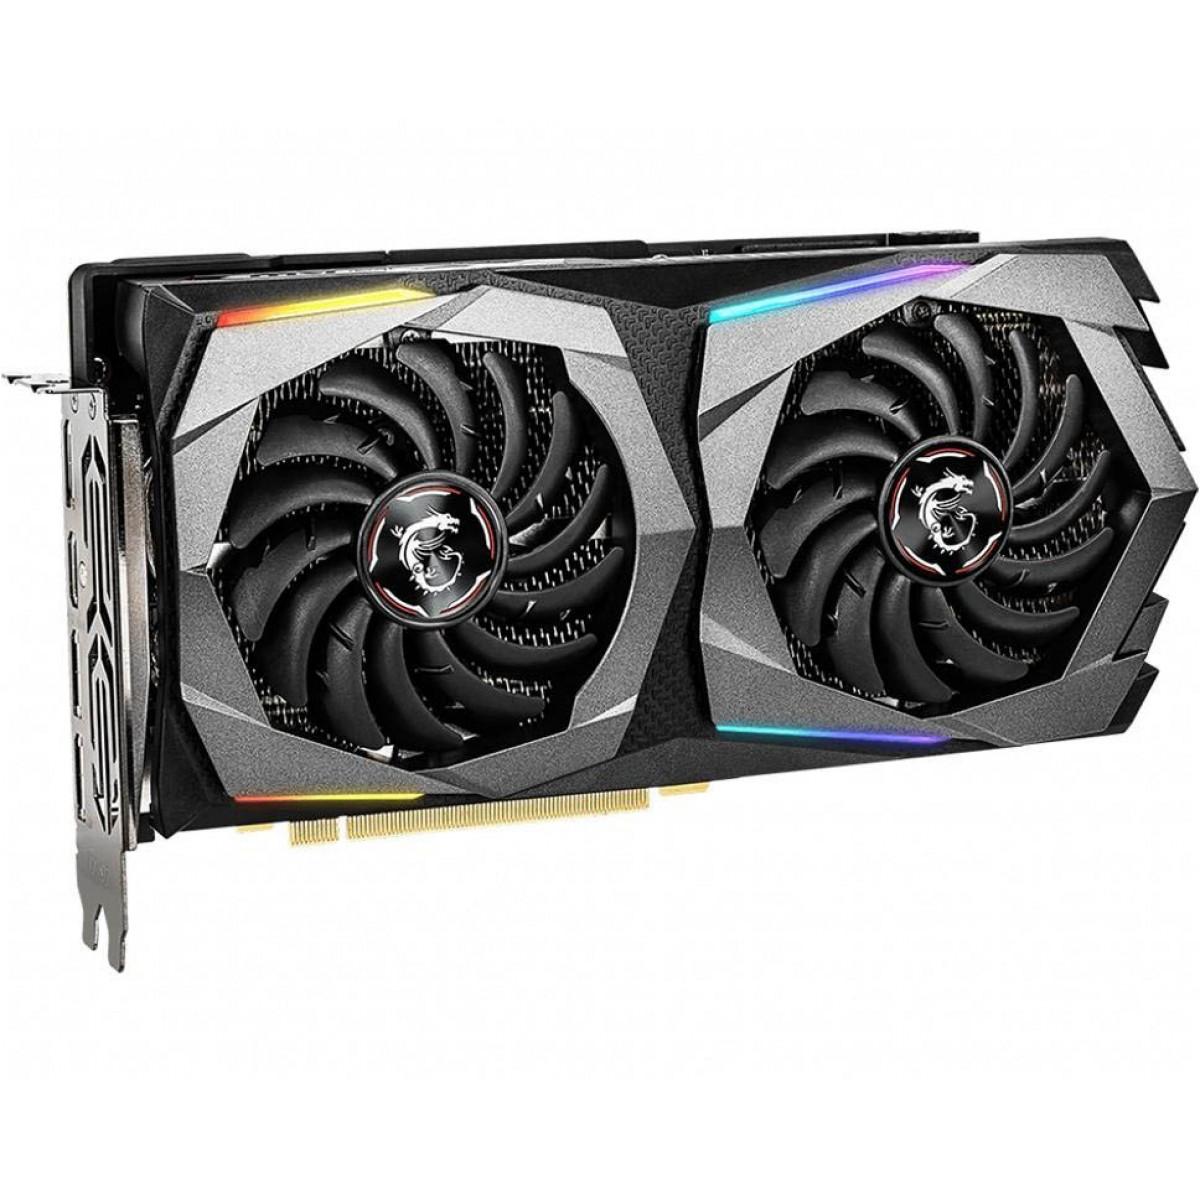 Placa de Video MSI GeForce RTX 2060 Super GAMING X Dual, 8GB GDDR6, 256Bit